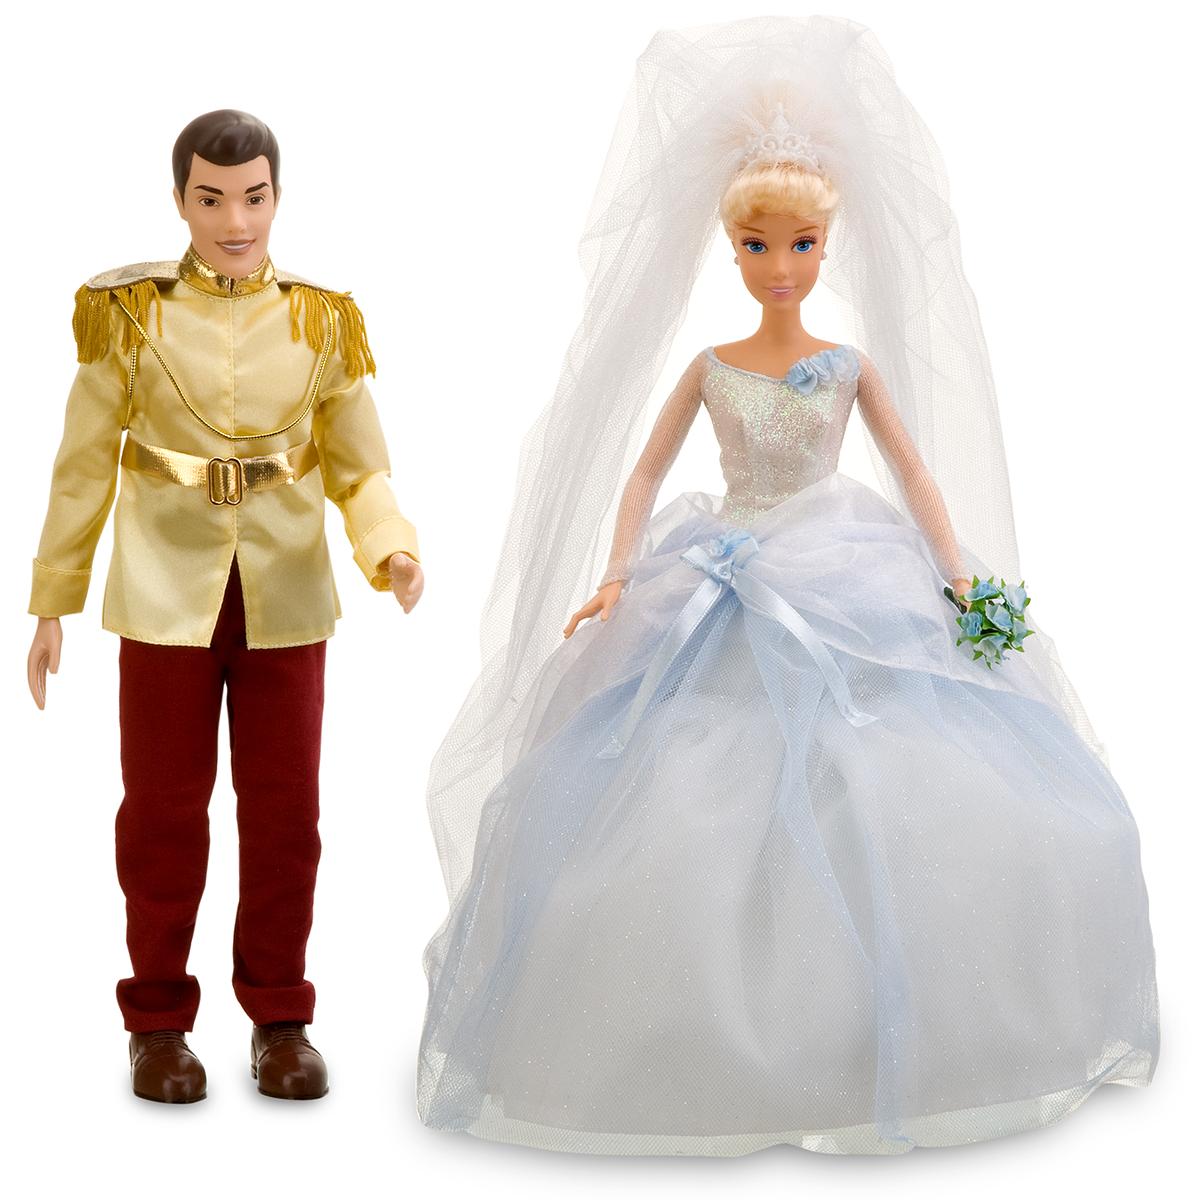 Cinderella Wedding Ring Set | And how to know if ... |Disney Princess Wedding Set